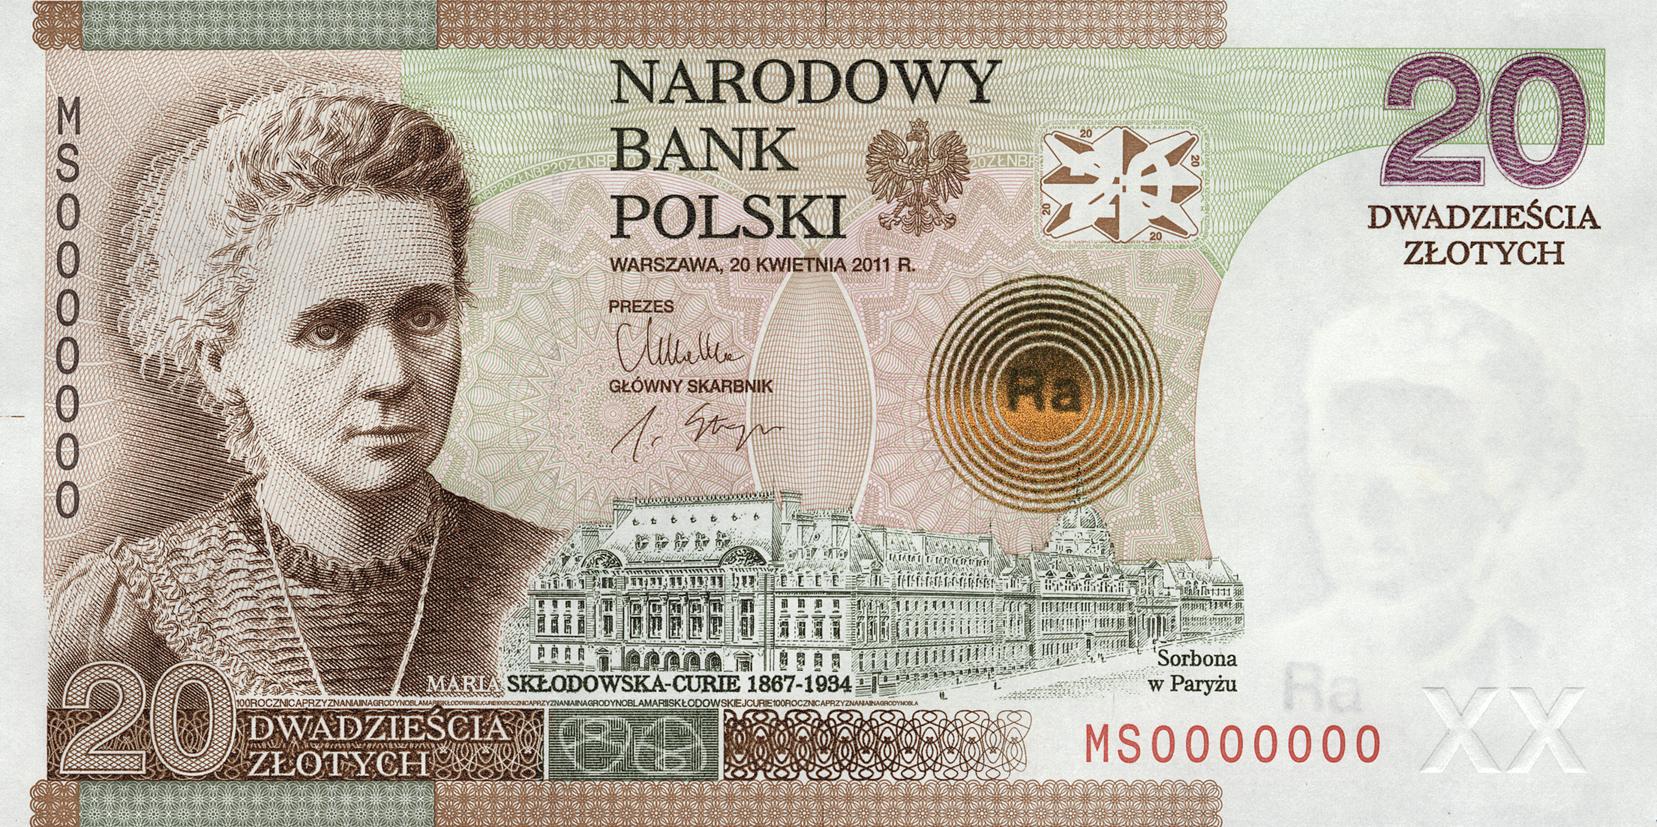 Maria Skłodowska-Curie znowu na banknocie